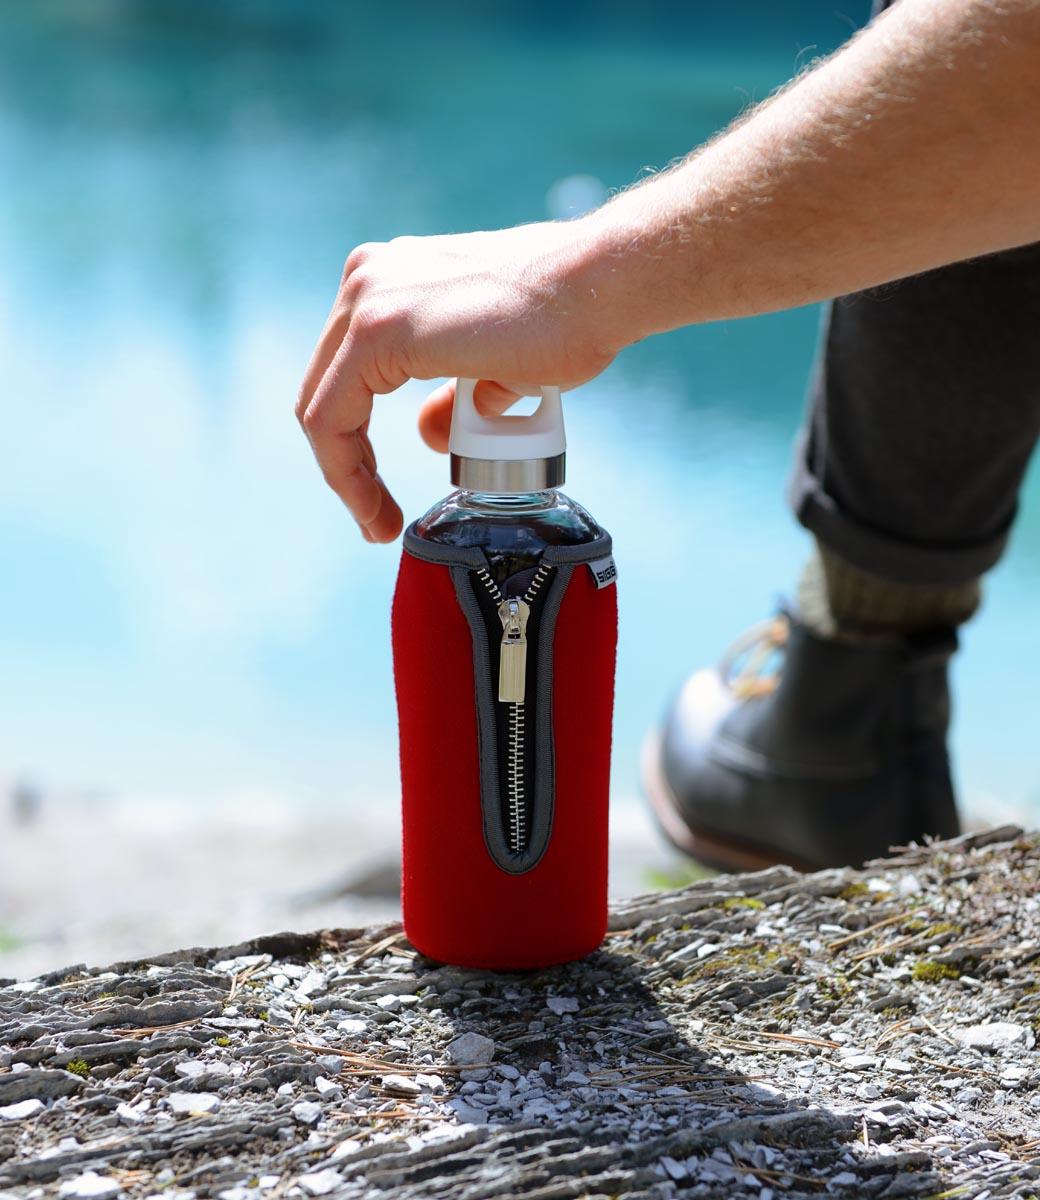 SIGG STELLA 系列 Neoprene 紅色潛水布套實驗室級玻璃水壺